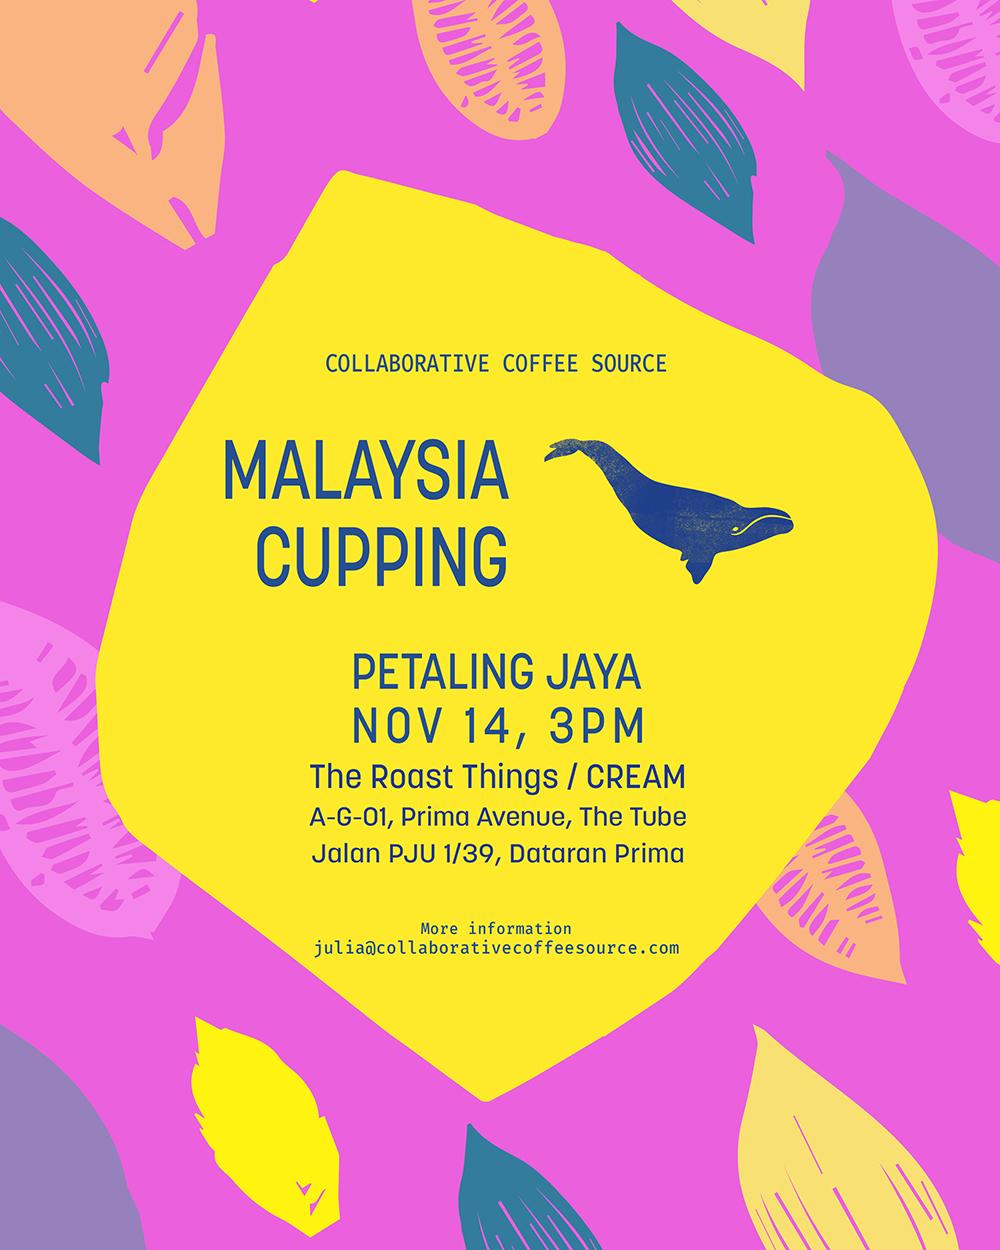 Malaysia Cupping sm.jpg